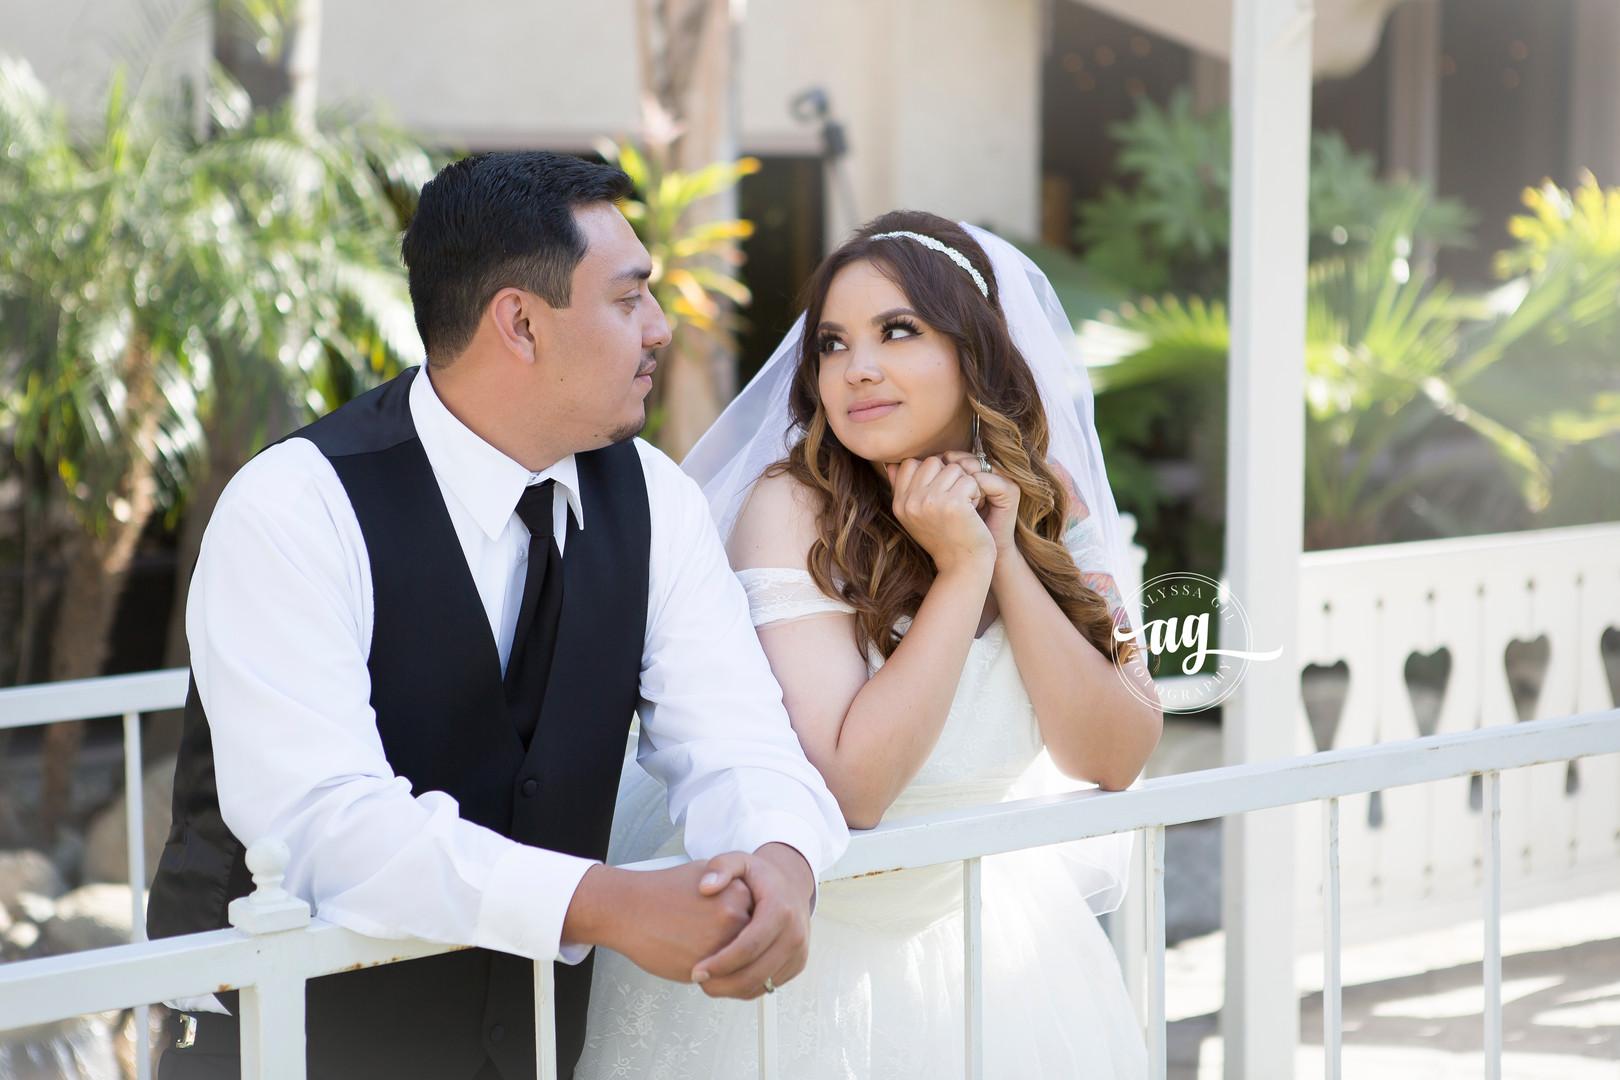 Alyssa Gil Photography - Wedding Portrai